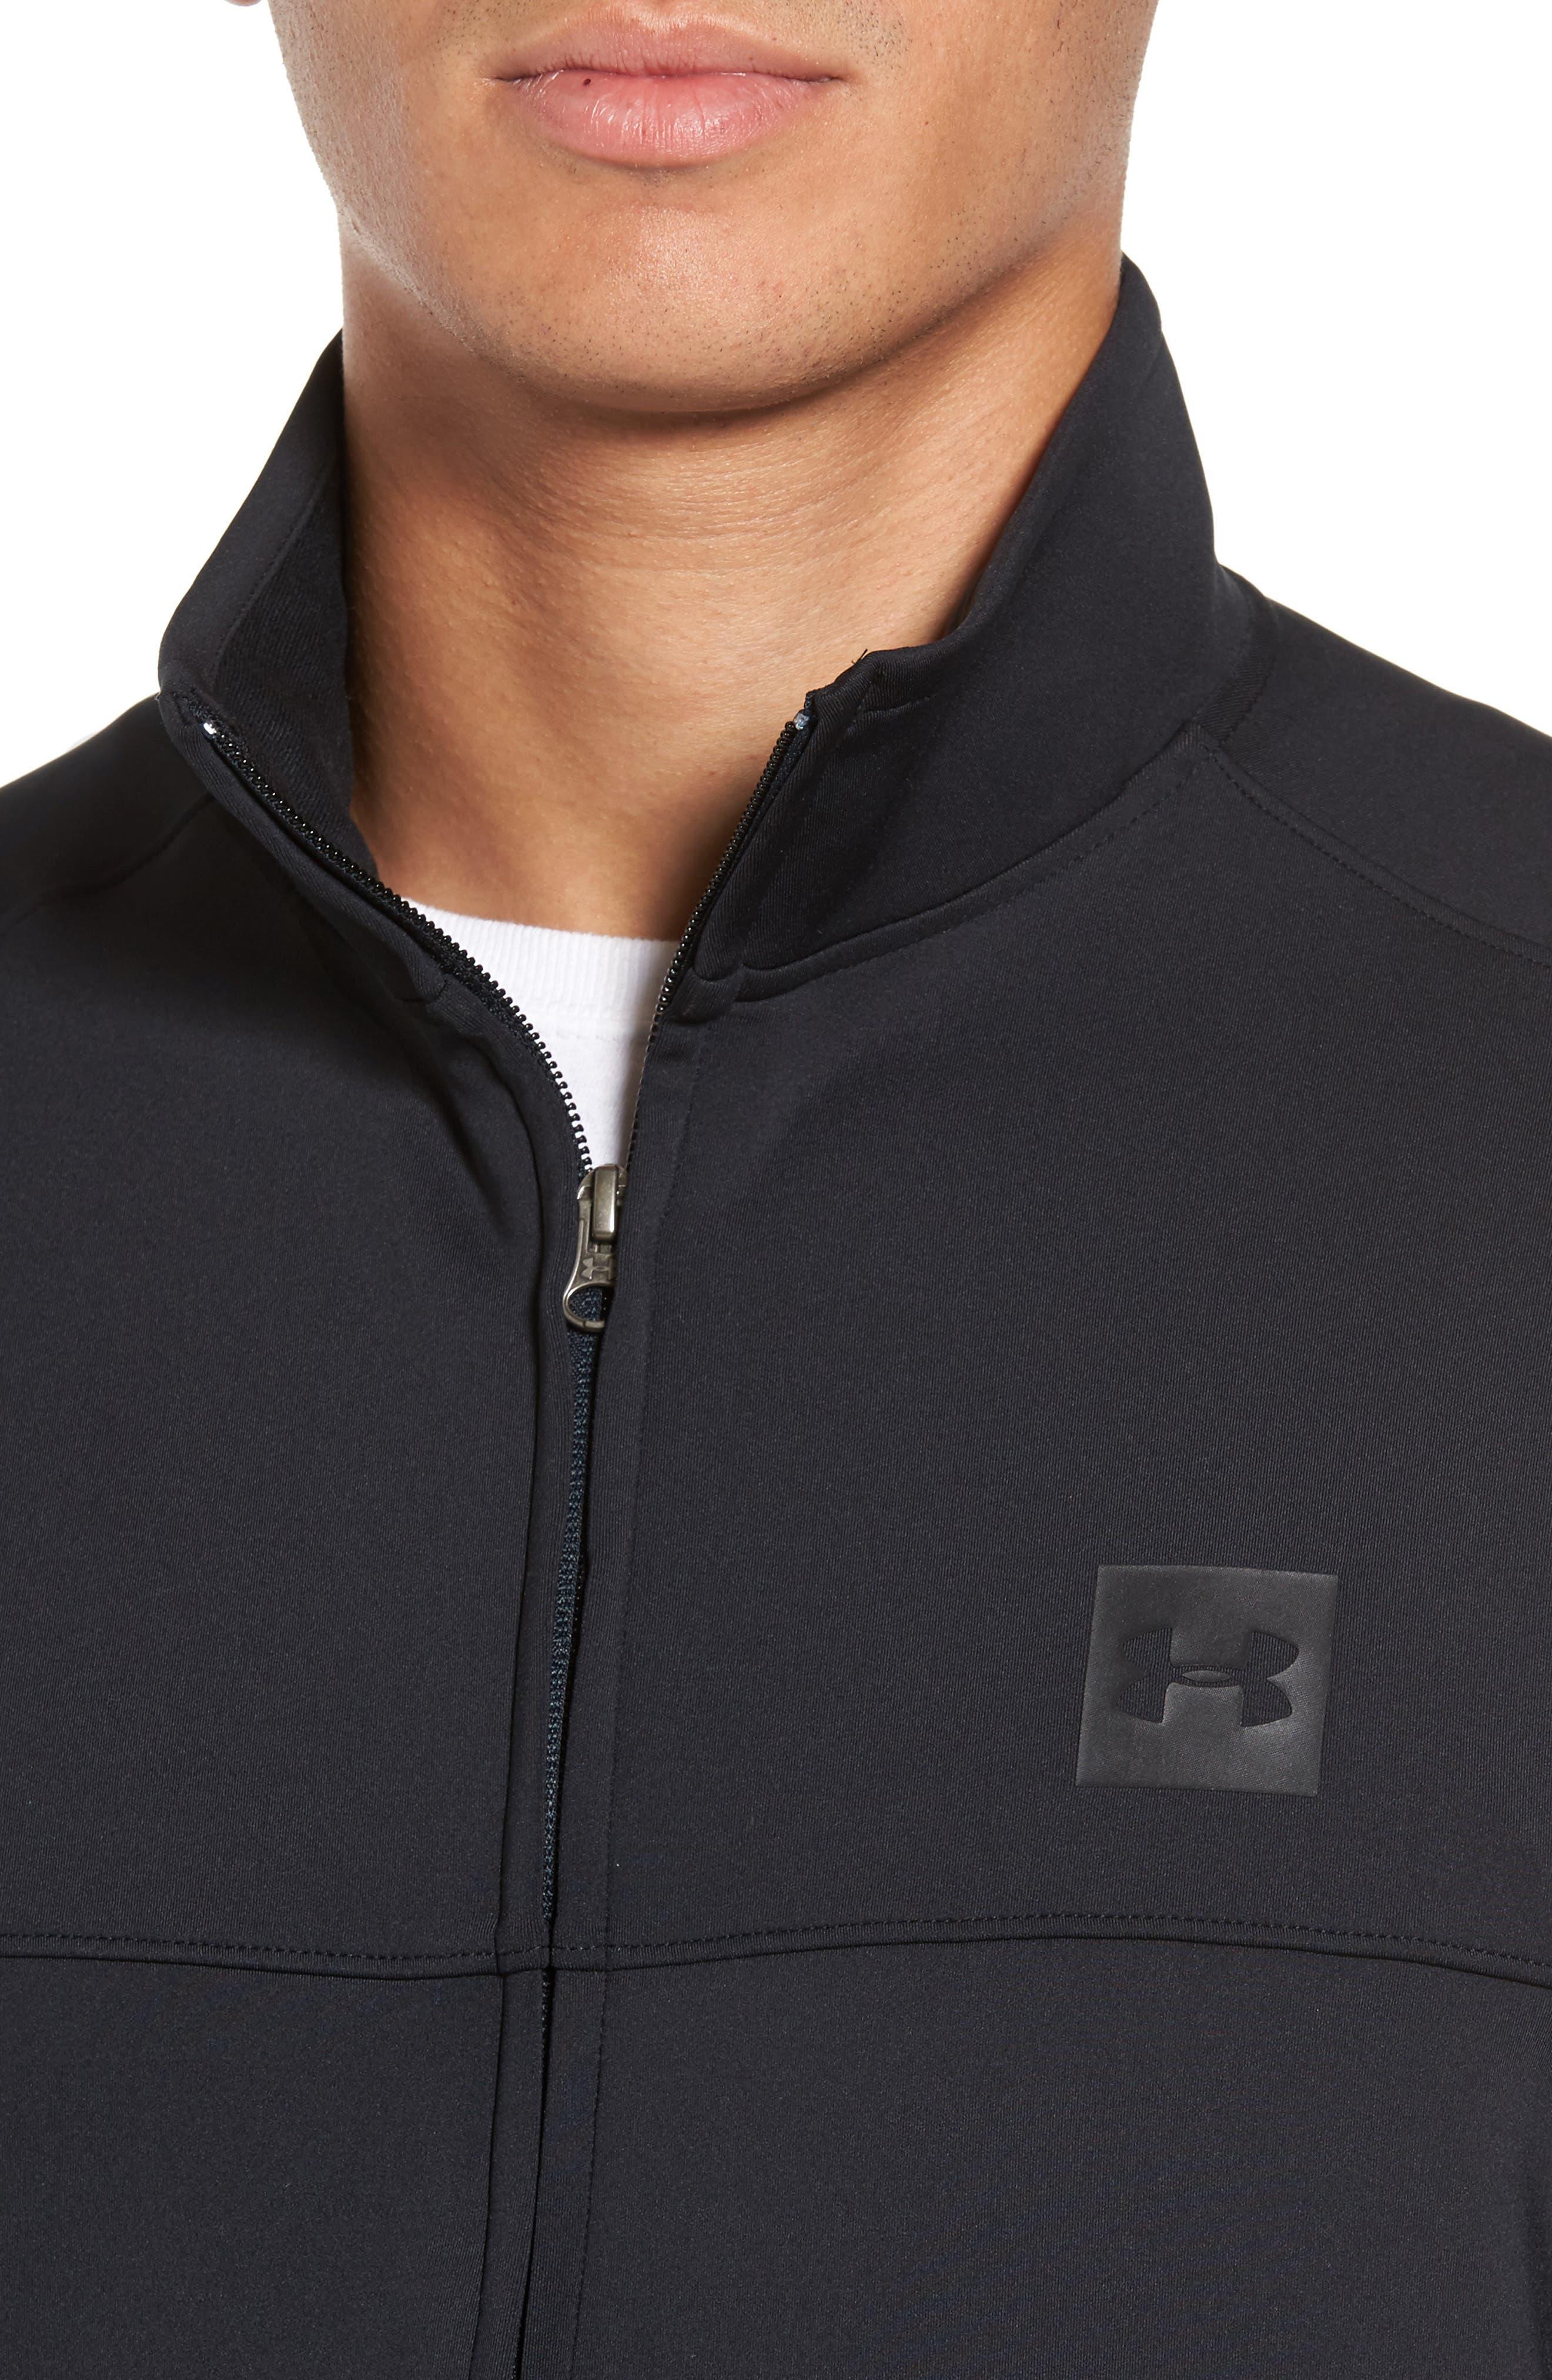 Sportstyle Track Jacket,                             Alternate thumbnail 4, color,                             Black / / Black